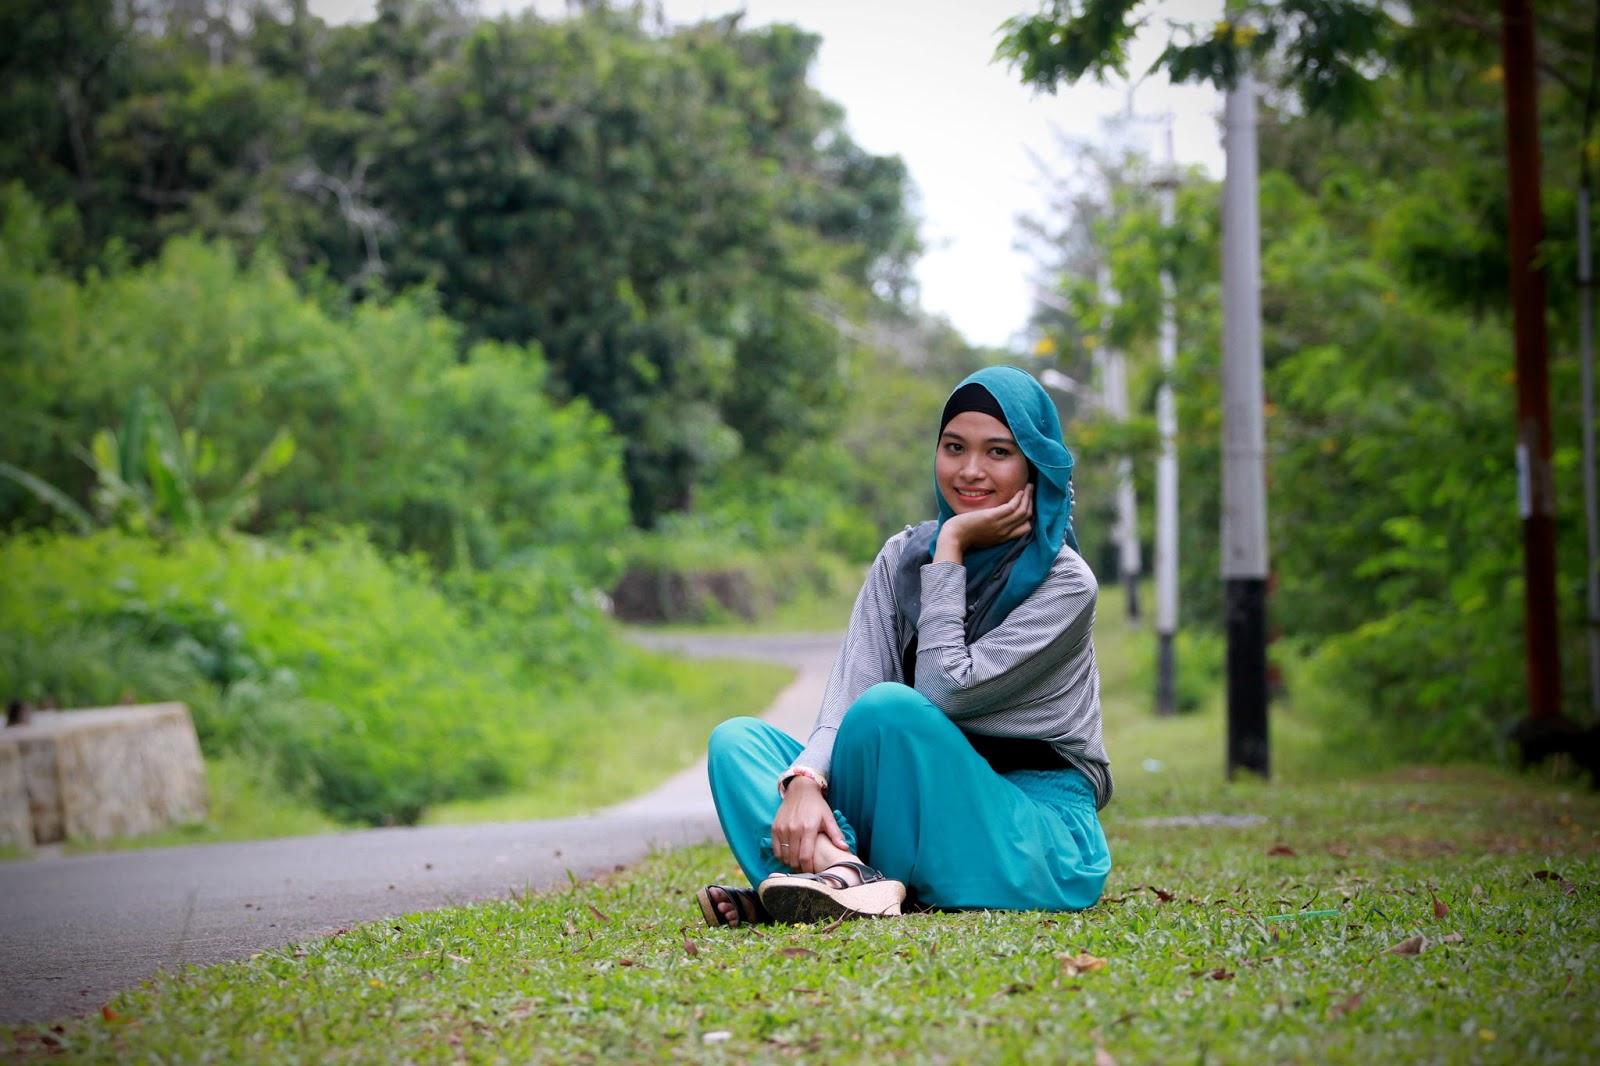 Konsep Foto Model Hijab Igo dalam Fotografi Hijab cantik